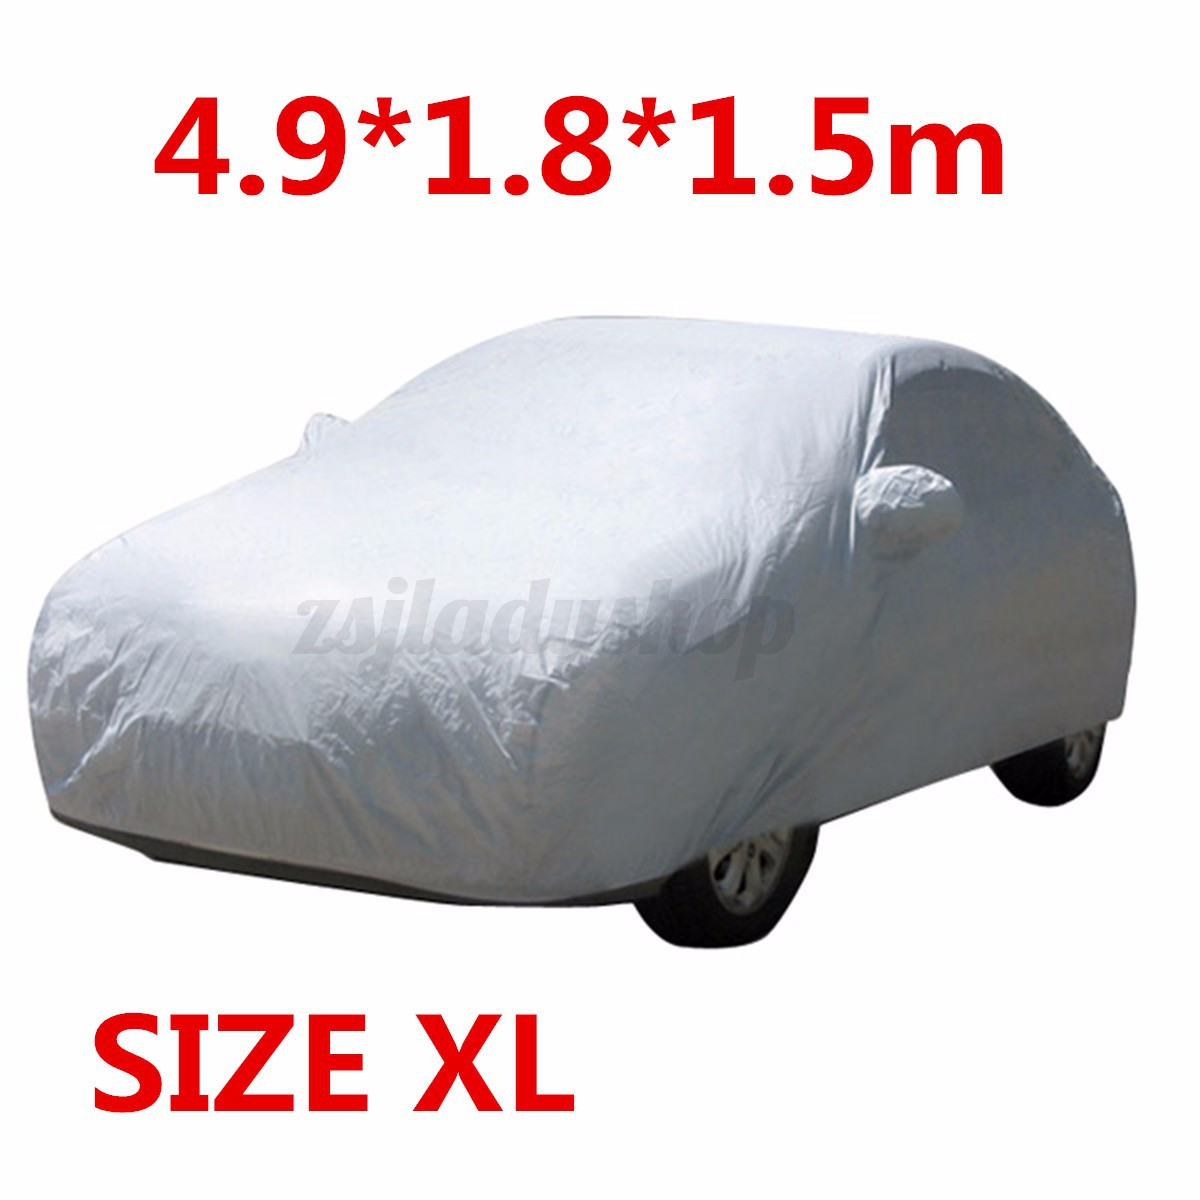 Full Car Cover Waterproof Outdoor Sun Uv Snow Dust Ebay